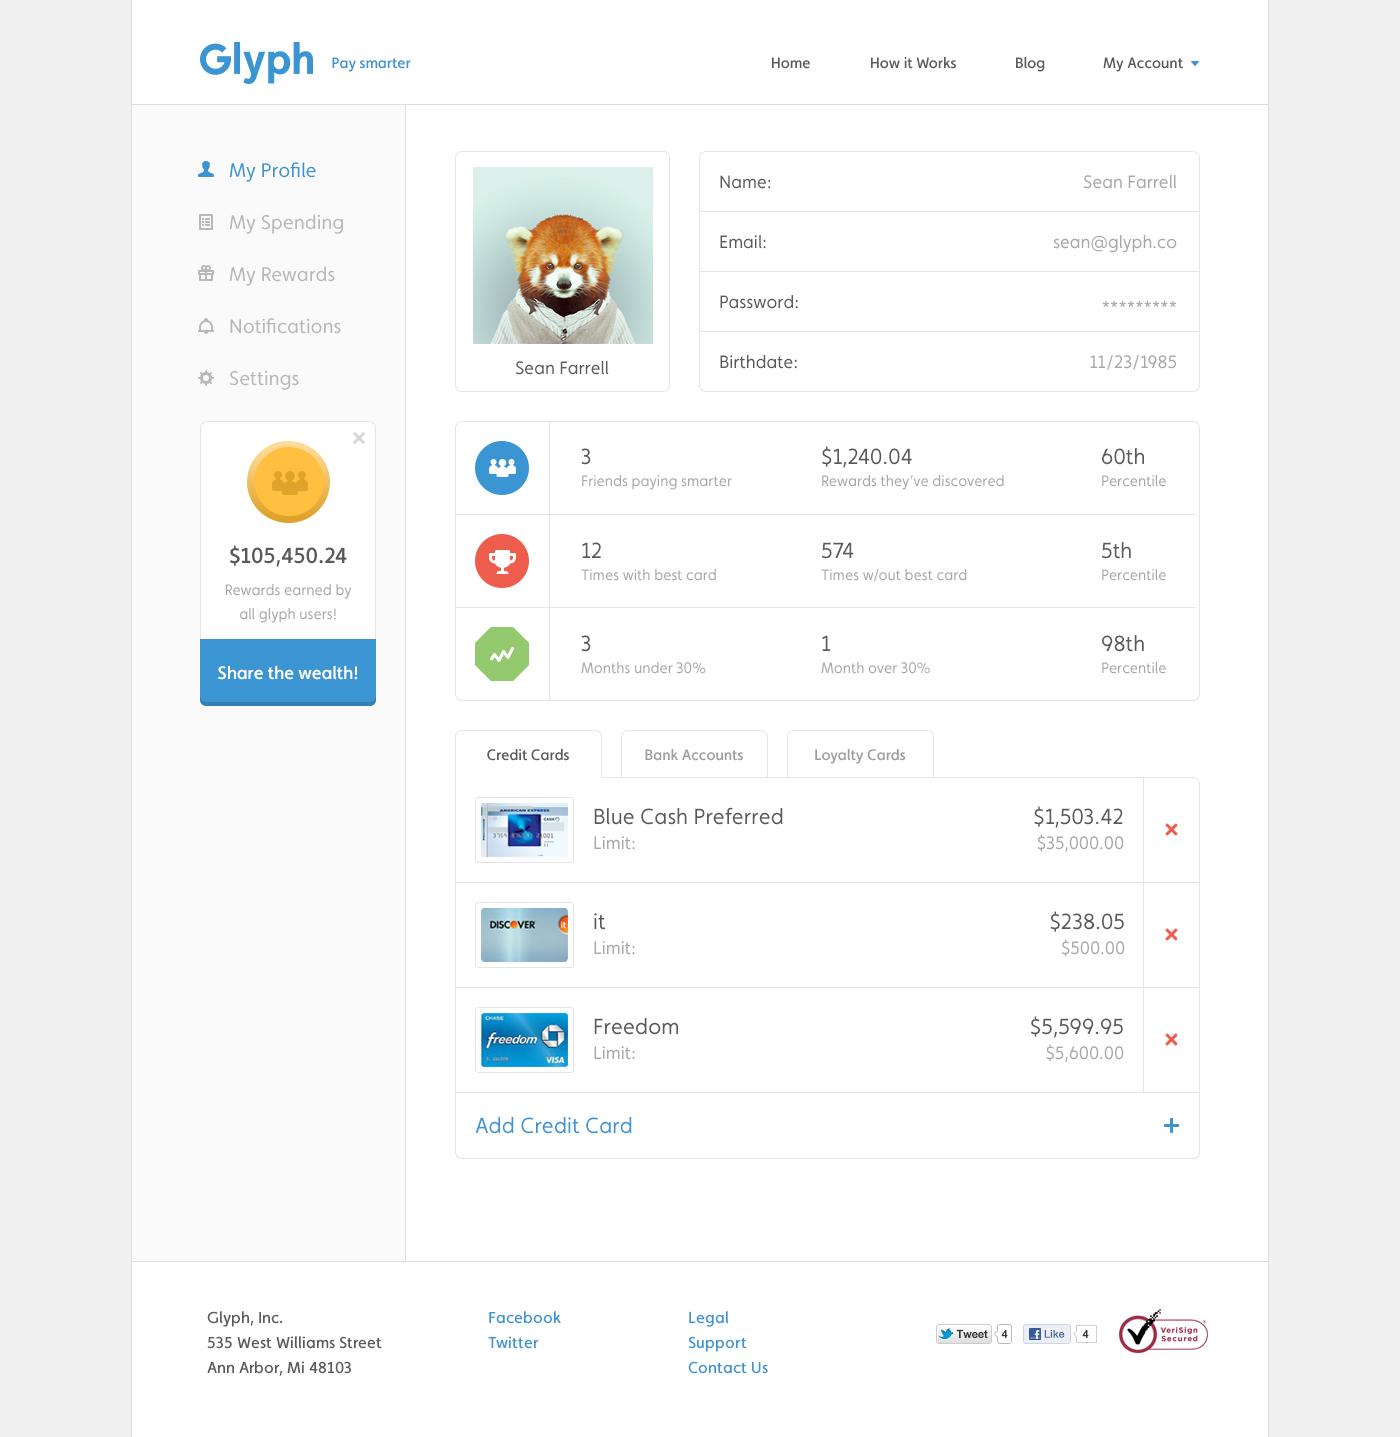 glyph-profile.jpg